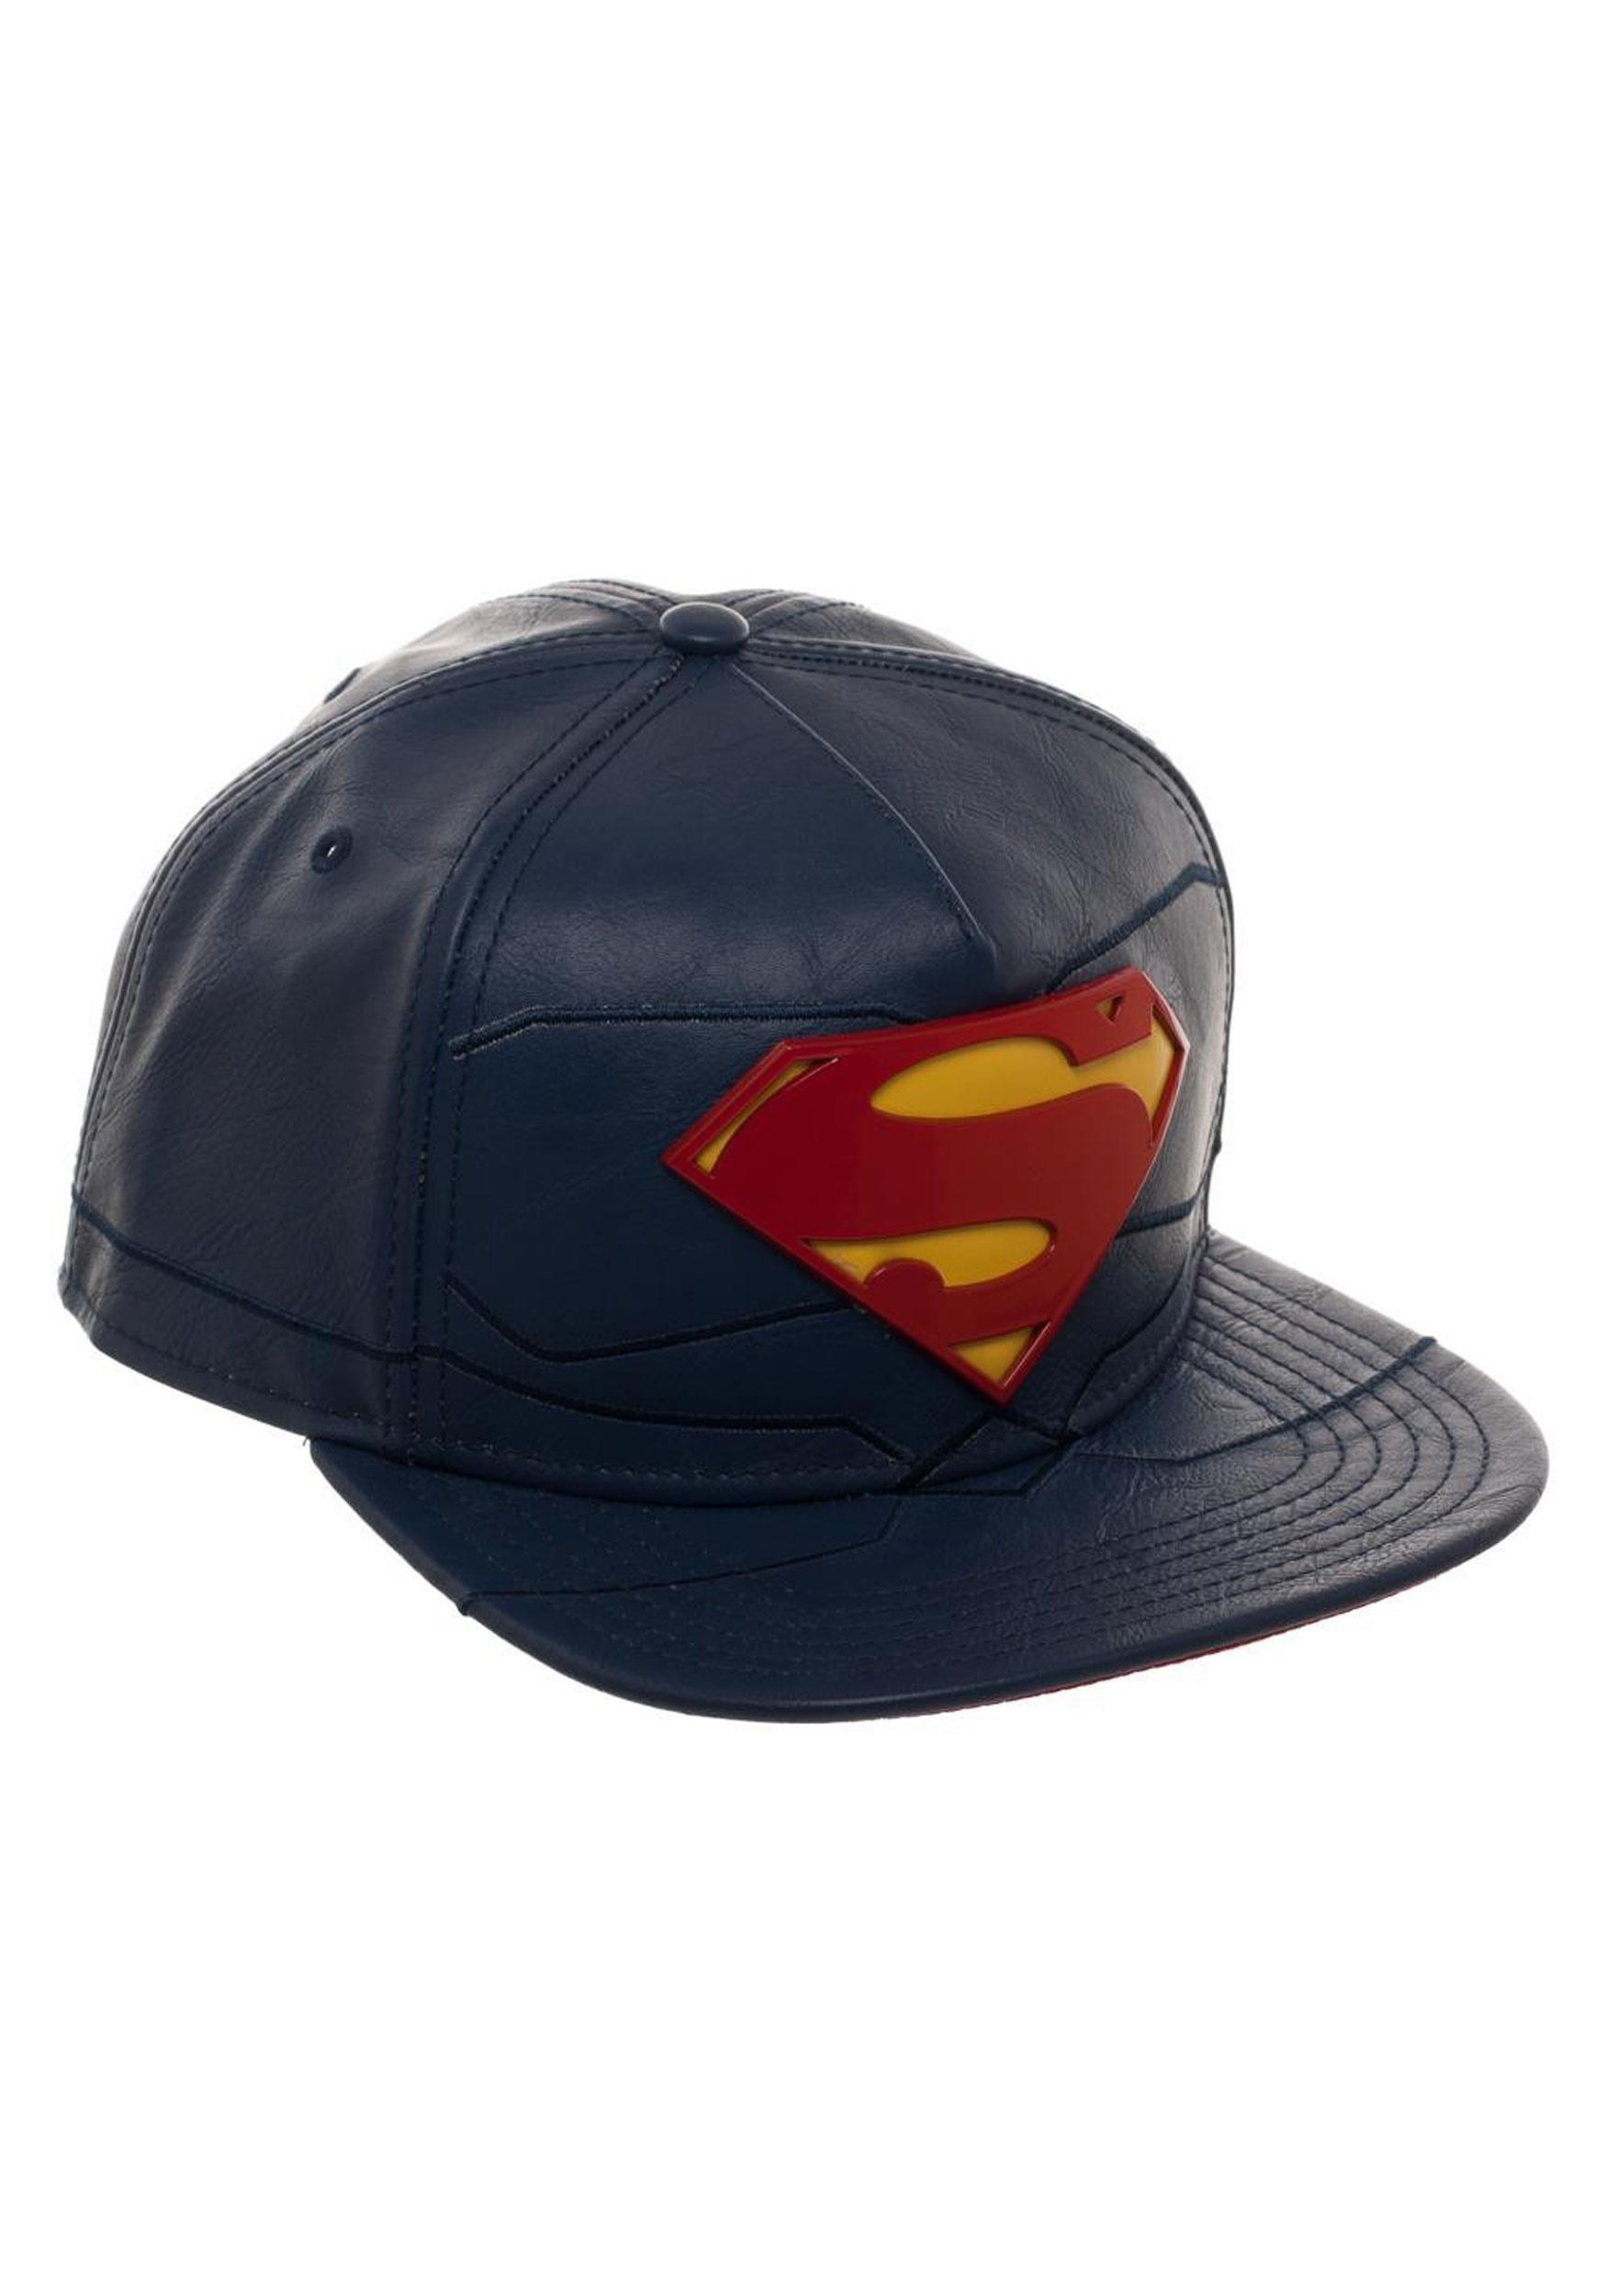 0b3ee9046 Superman Rebirth Suit Up Snapback